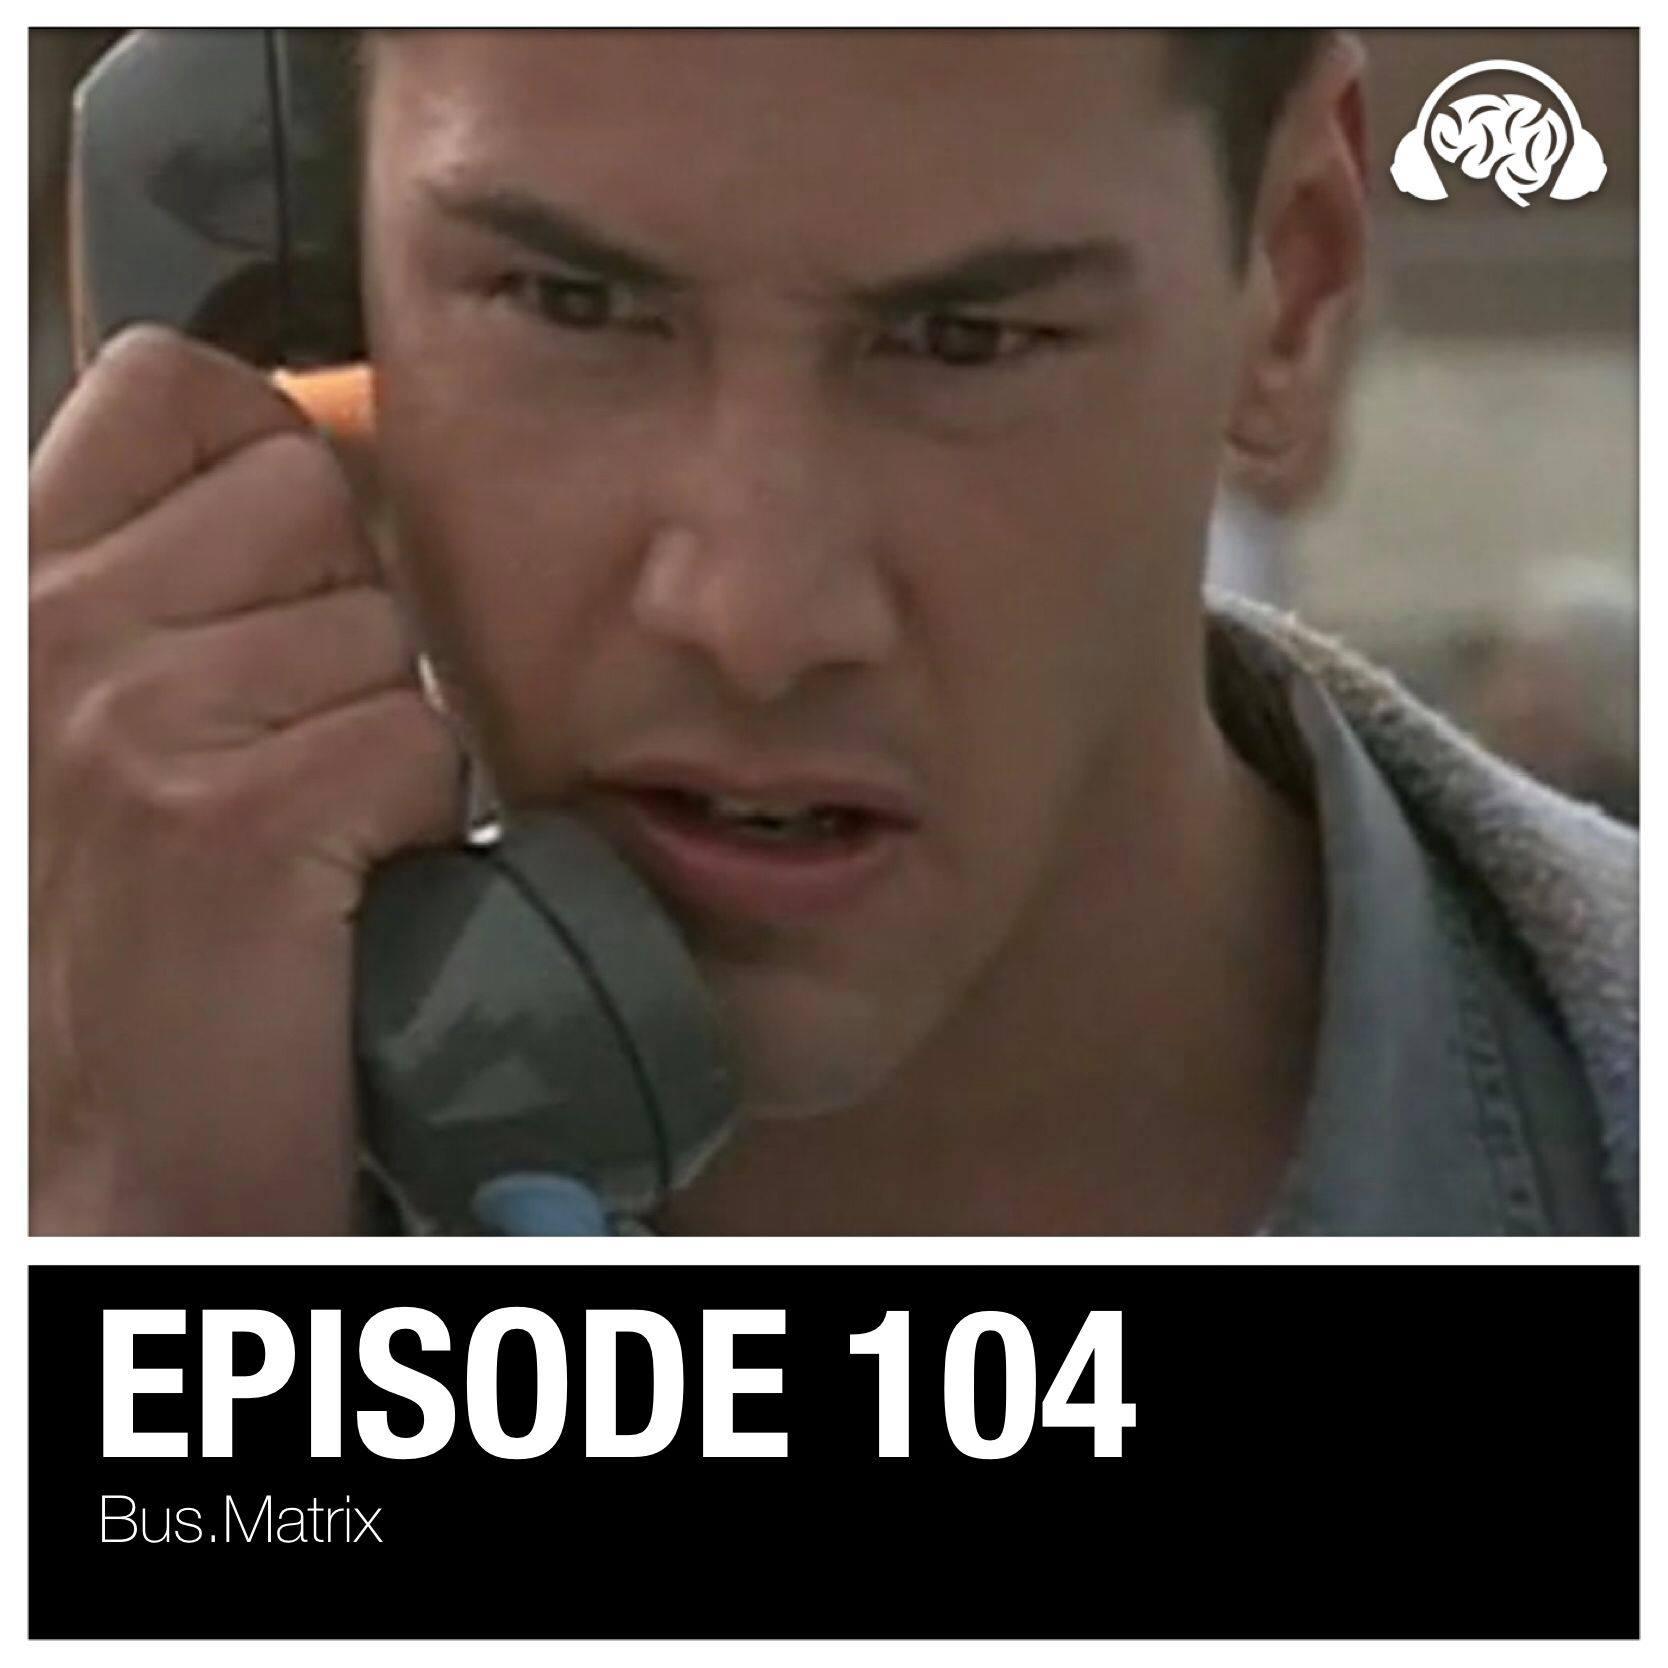 episode104.jpg